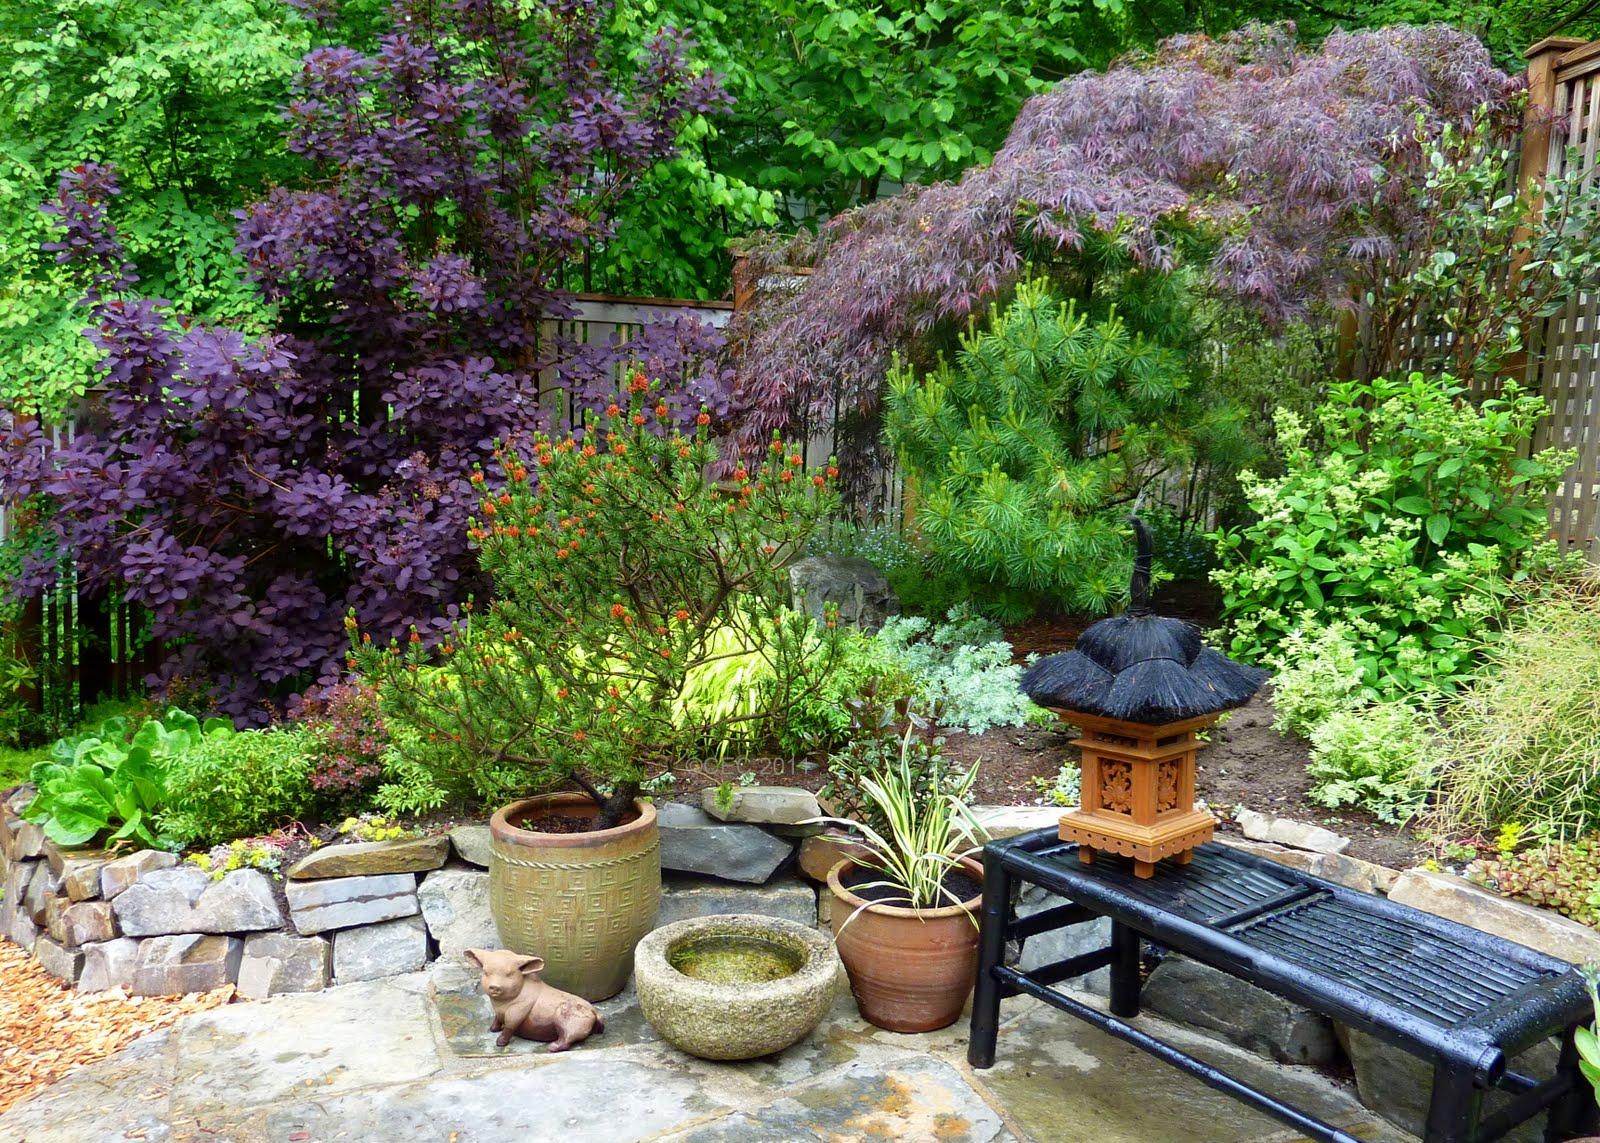 1000+ images about Ideaal voor een 'stadstuintje' on ... on Small Garden Sitting Area Ideas  id=59328